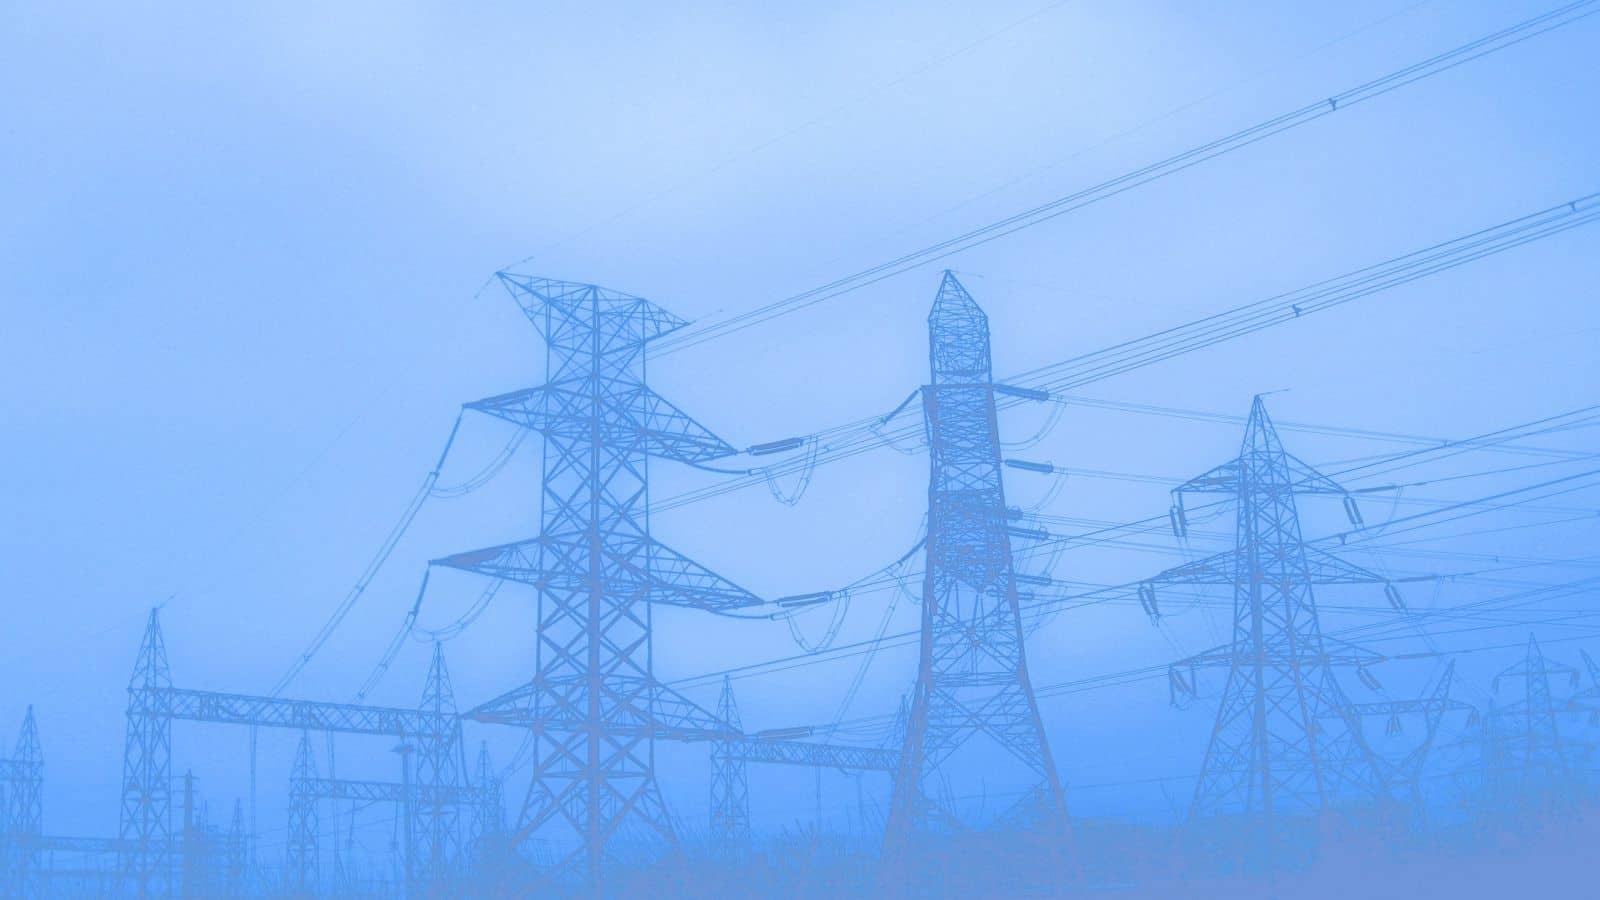 electricity power poles